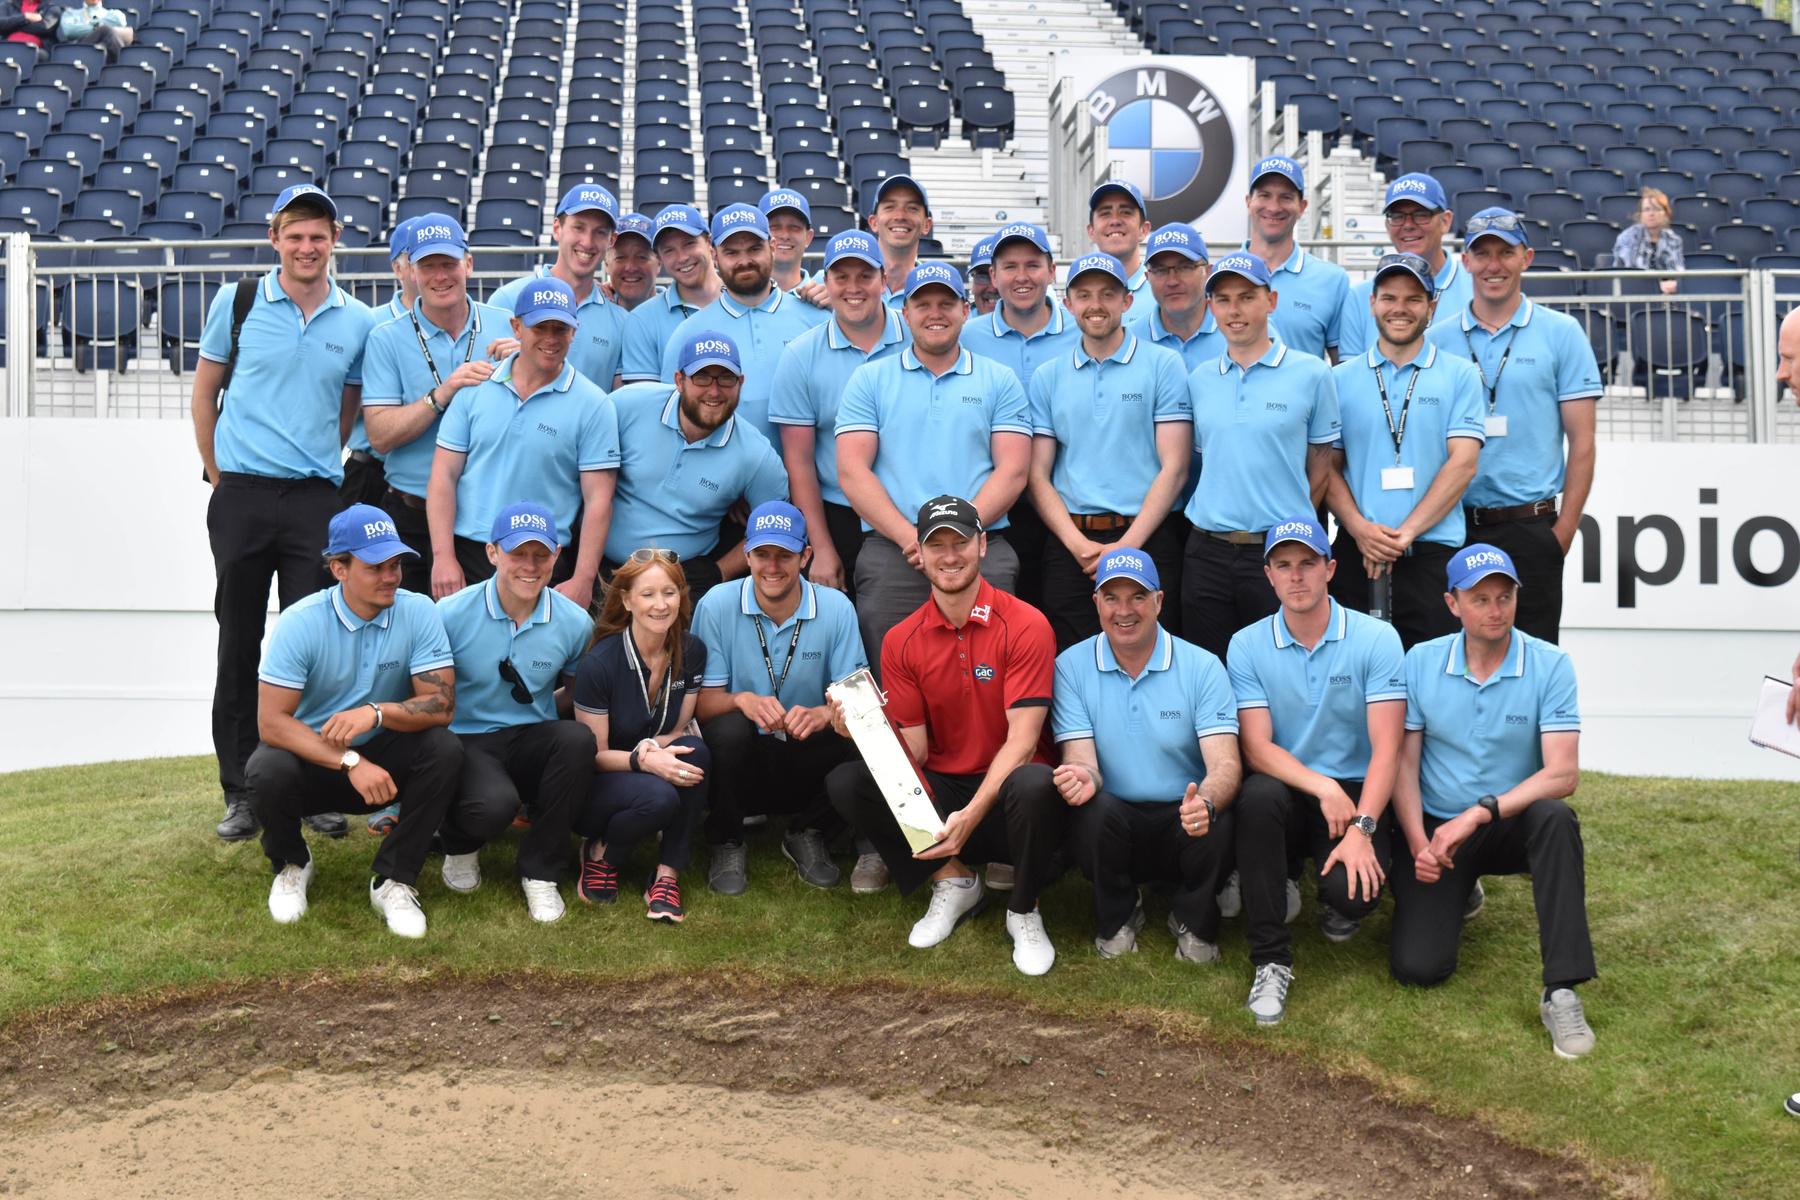 BMW PGA Championship 2016 winner Chris Wood alongside the BIGGA Support Team